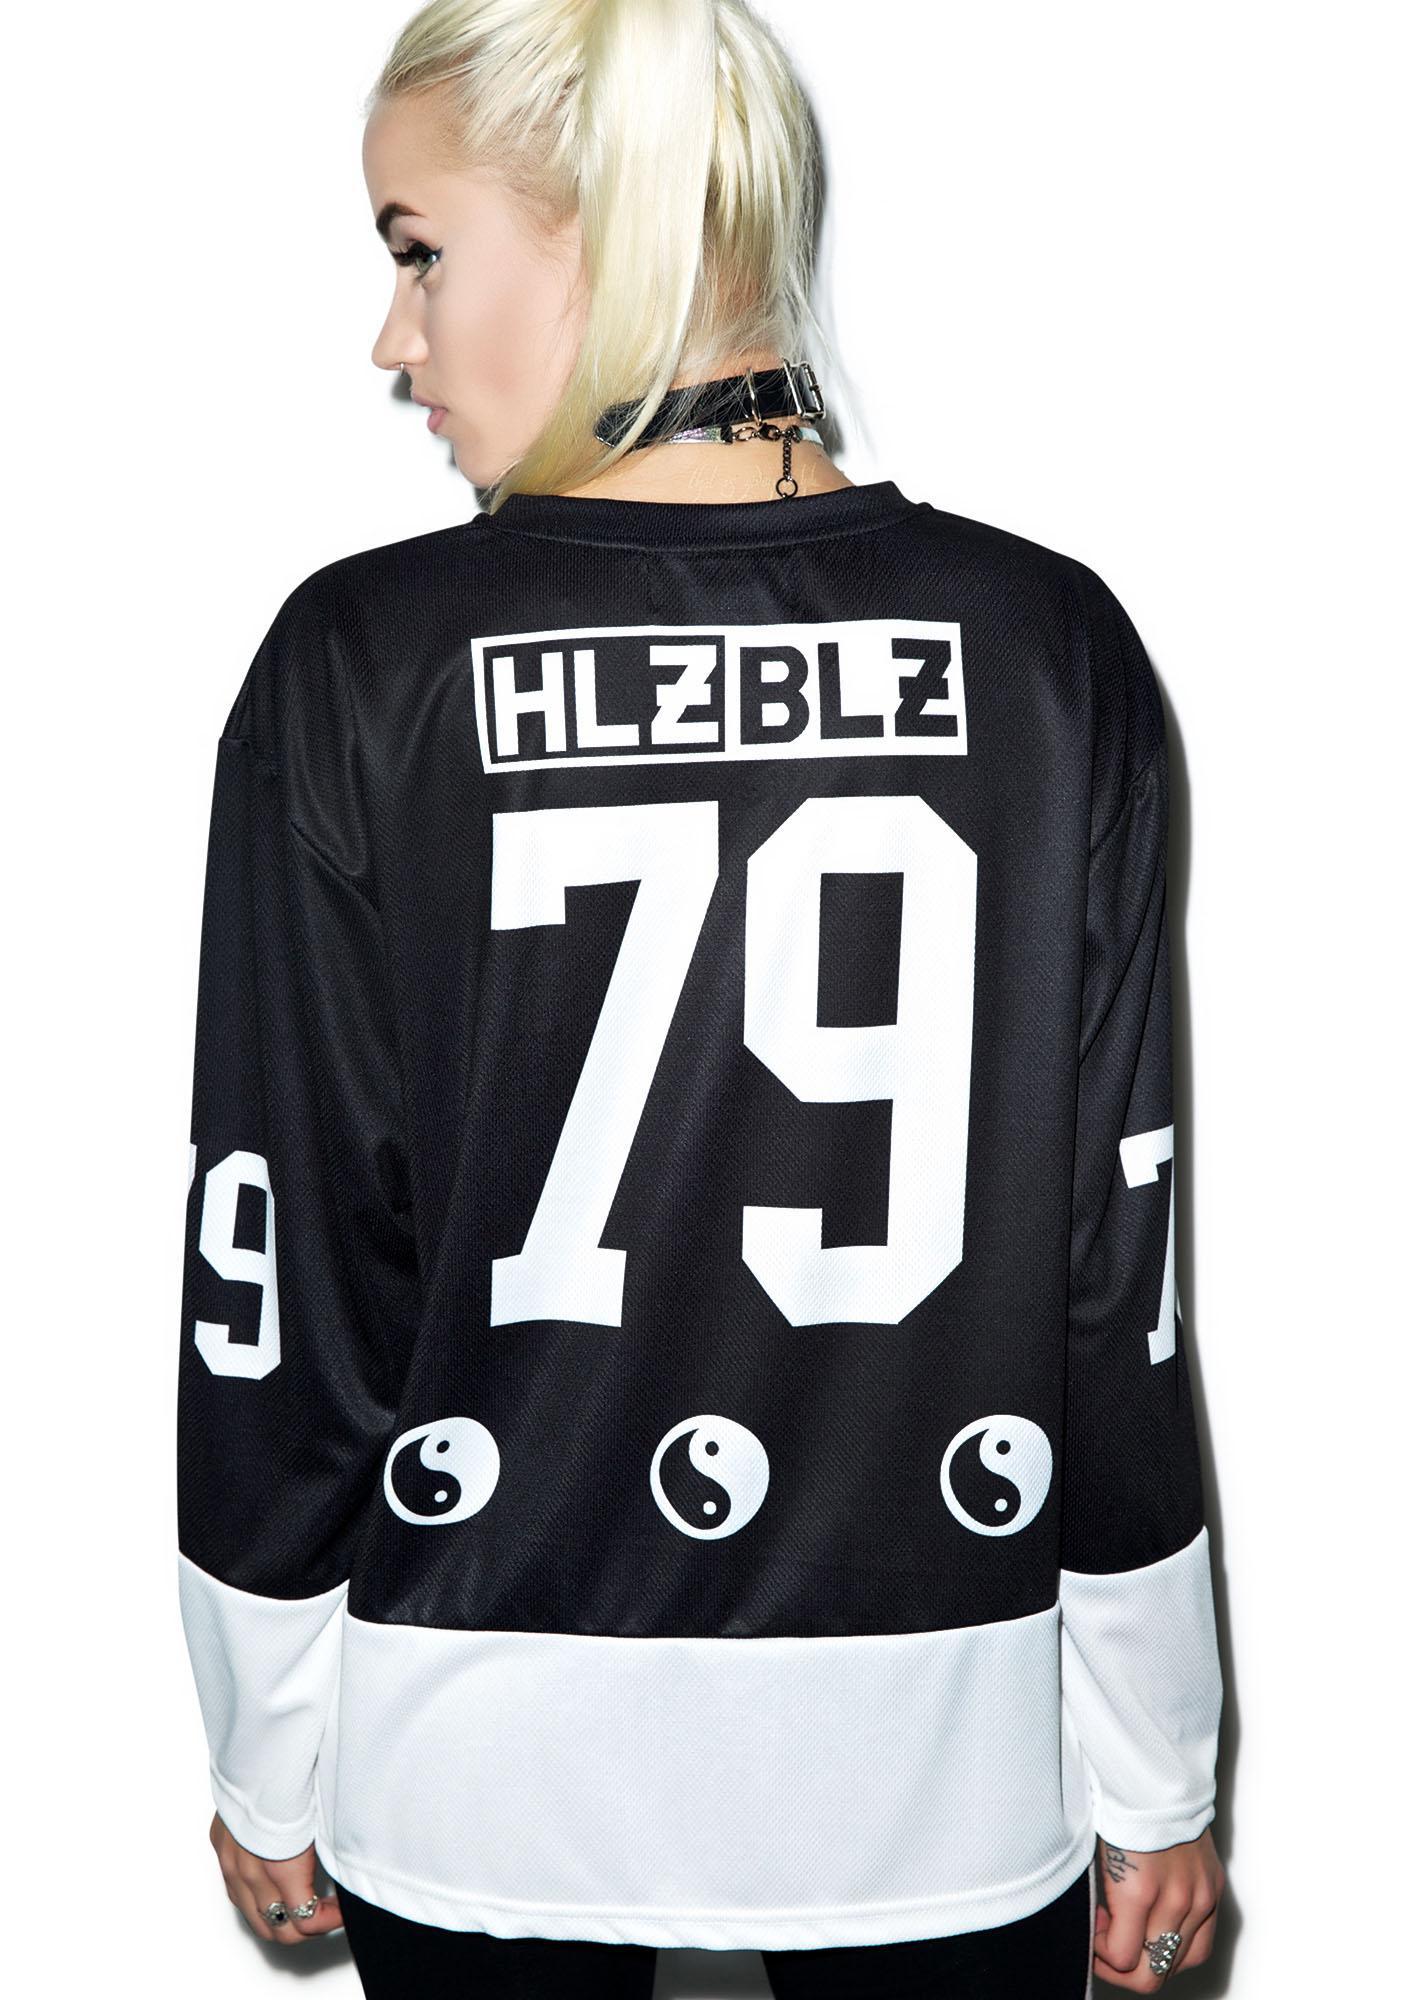 HLZBLZ Lucky Hockey Jersey